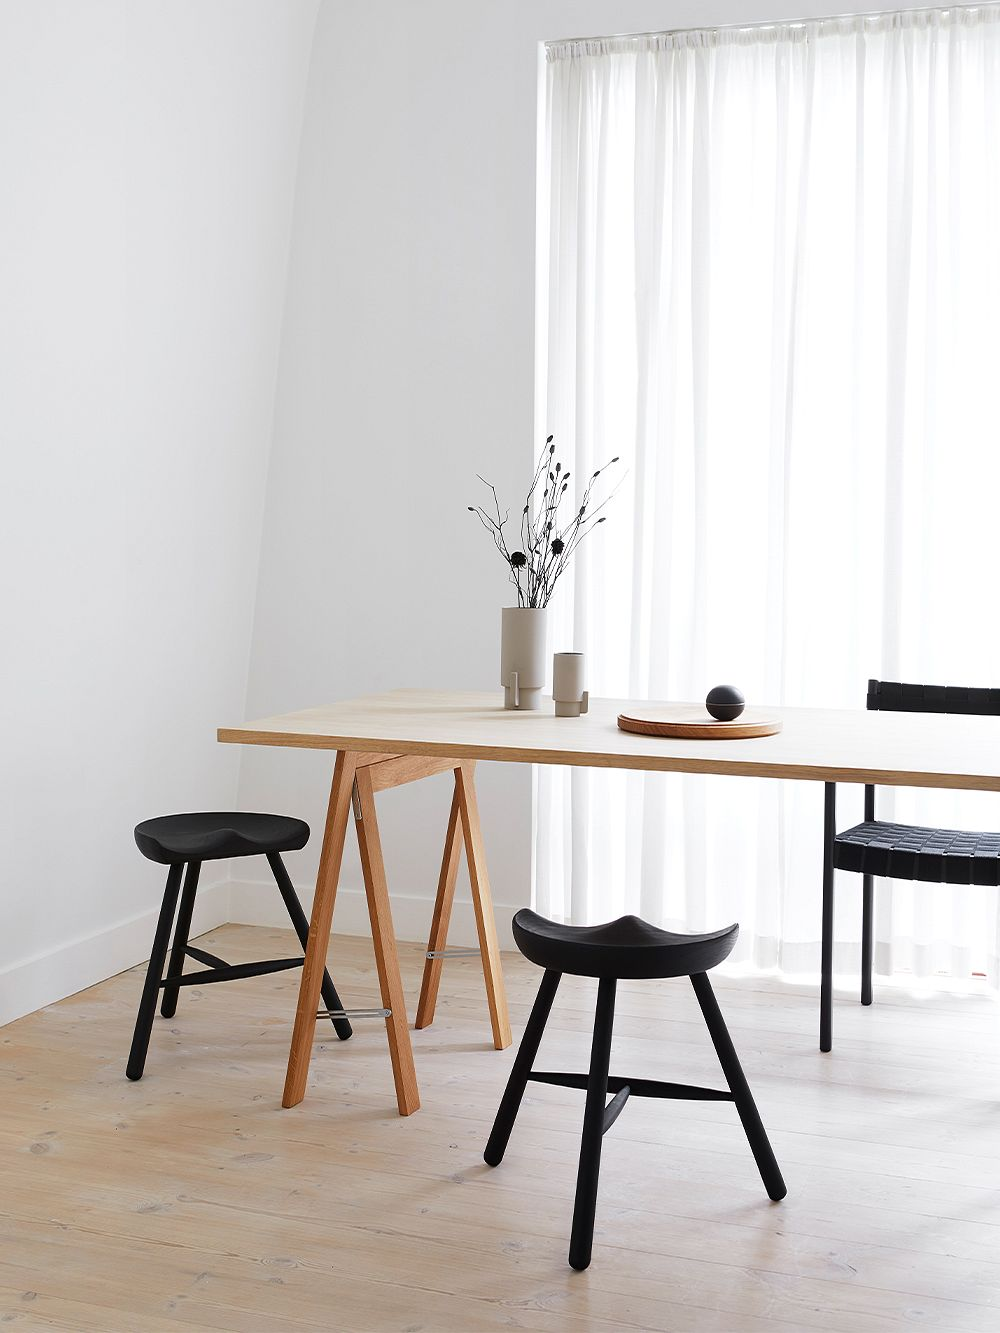 Form & Refine Shoemaker Chair No. 49 stool